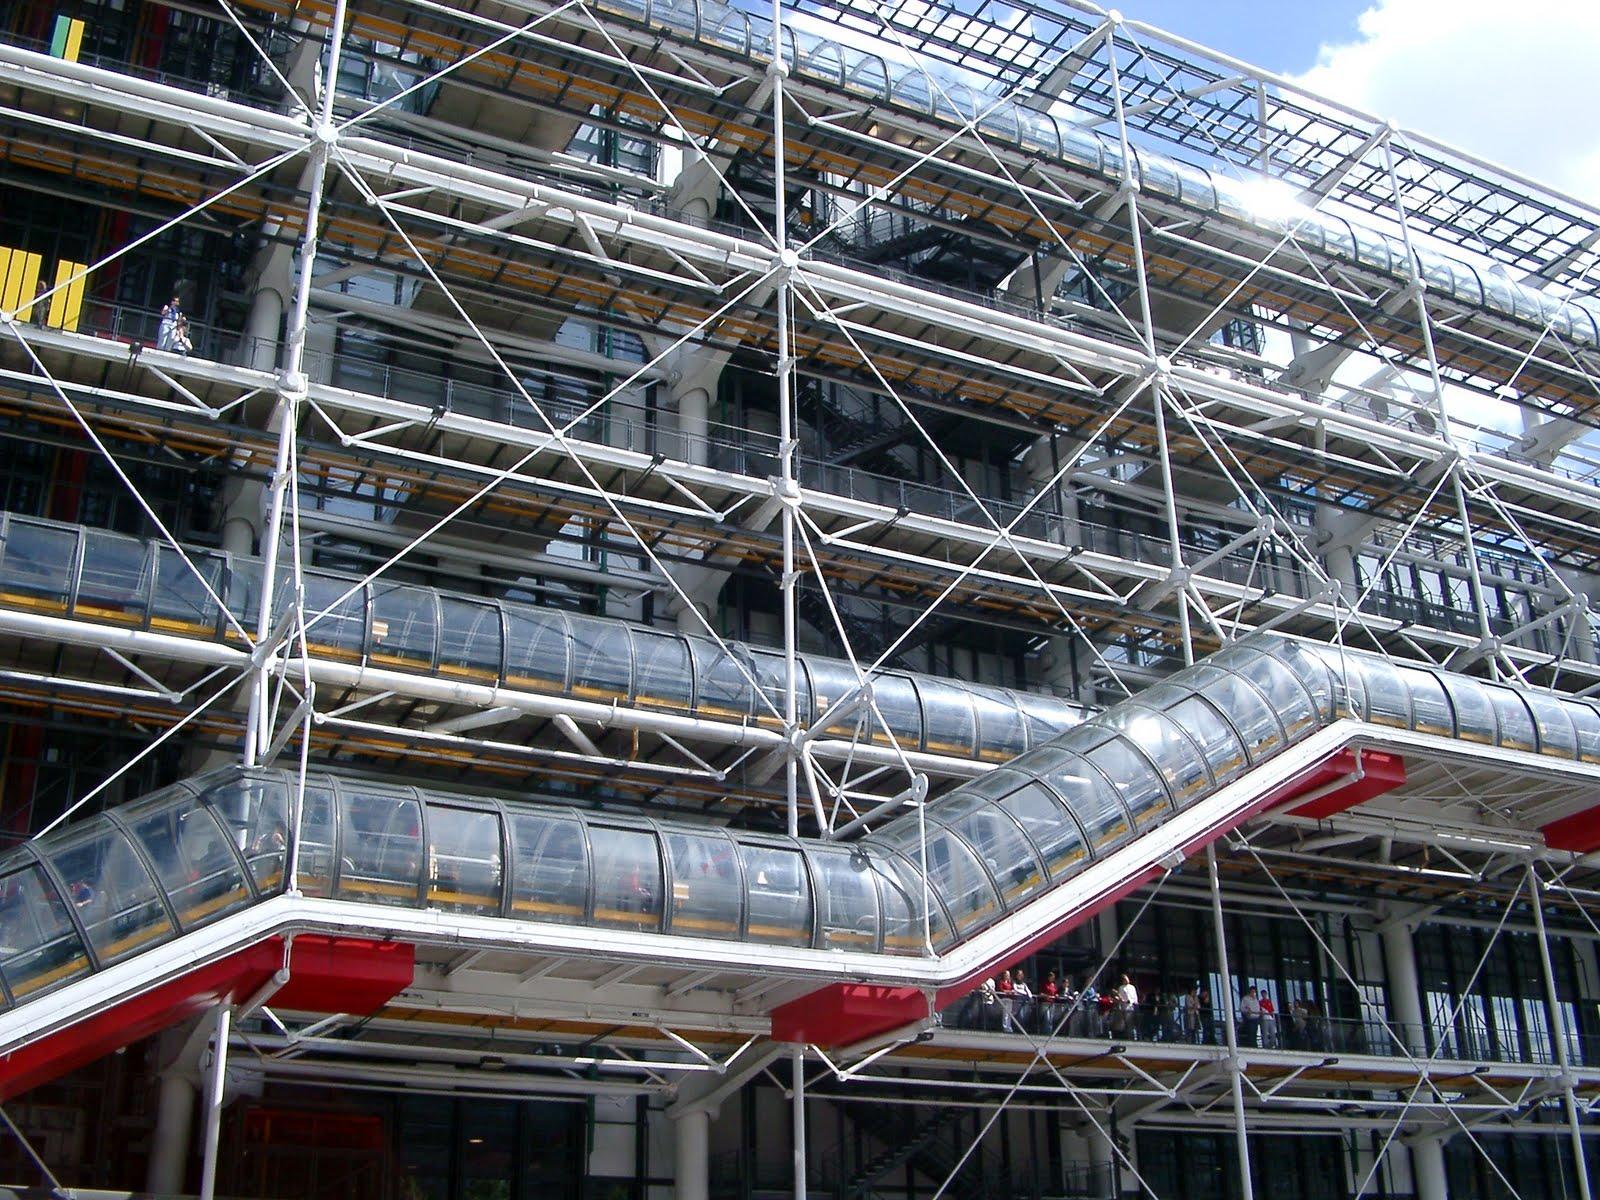 Nora fm centre pompidou national modern art museum paris for Art minimal centre pompidou